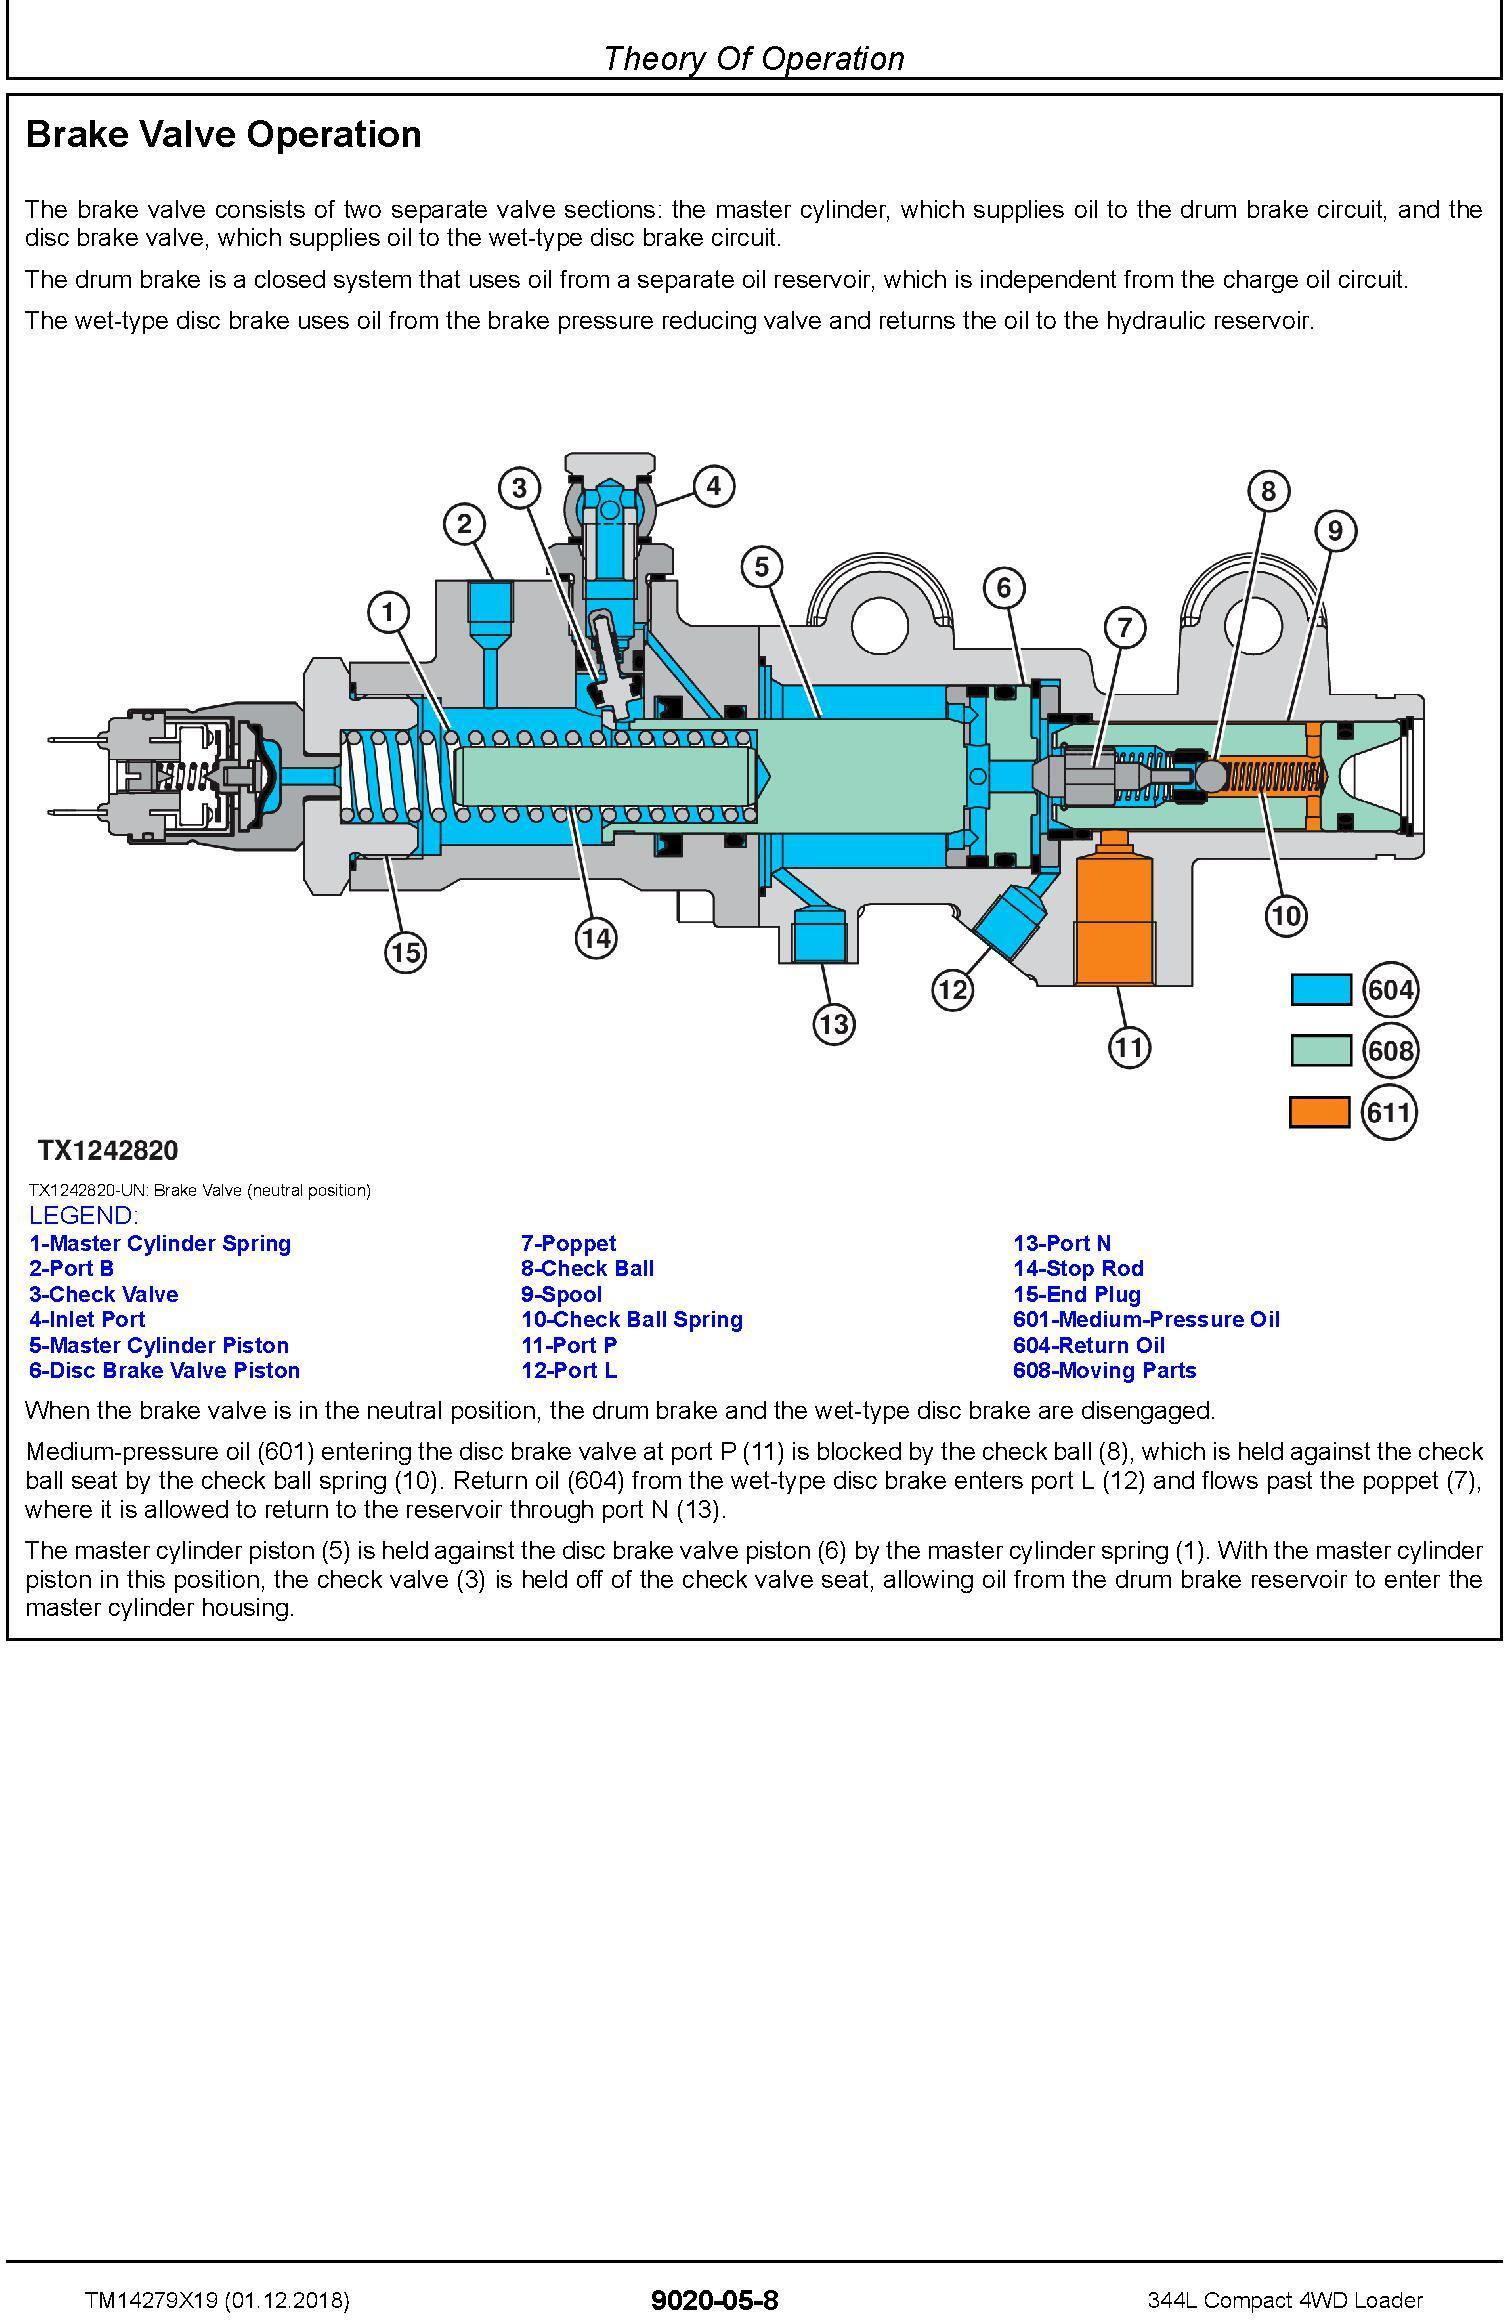 John Deere 344L (SN.B043142-) Compact 4WD Loader Diagnostic Technical Service Manual (TM14279X19) - 2